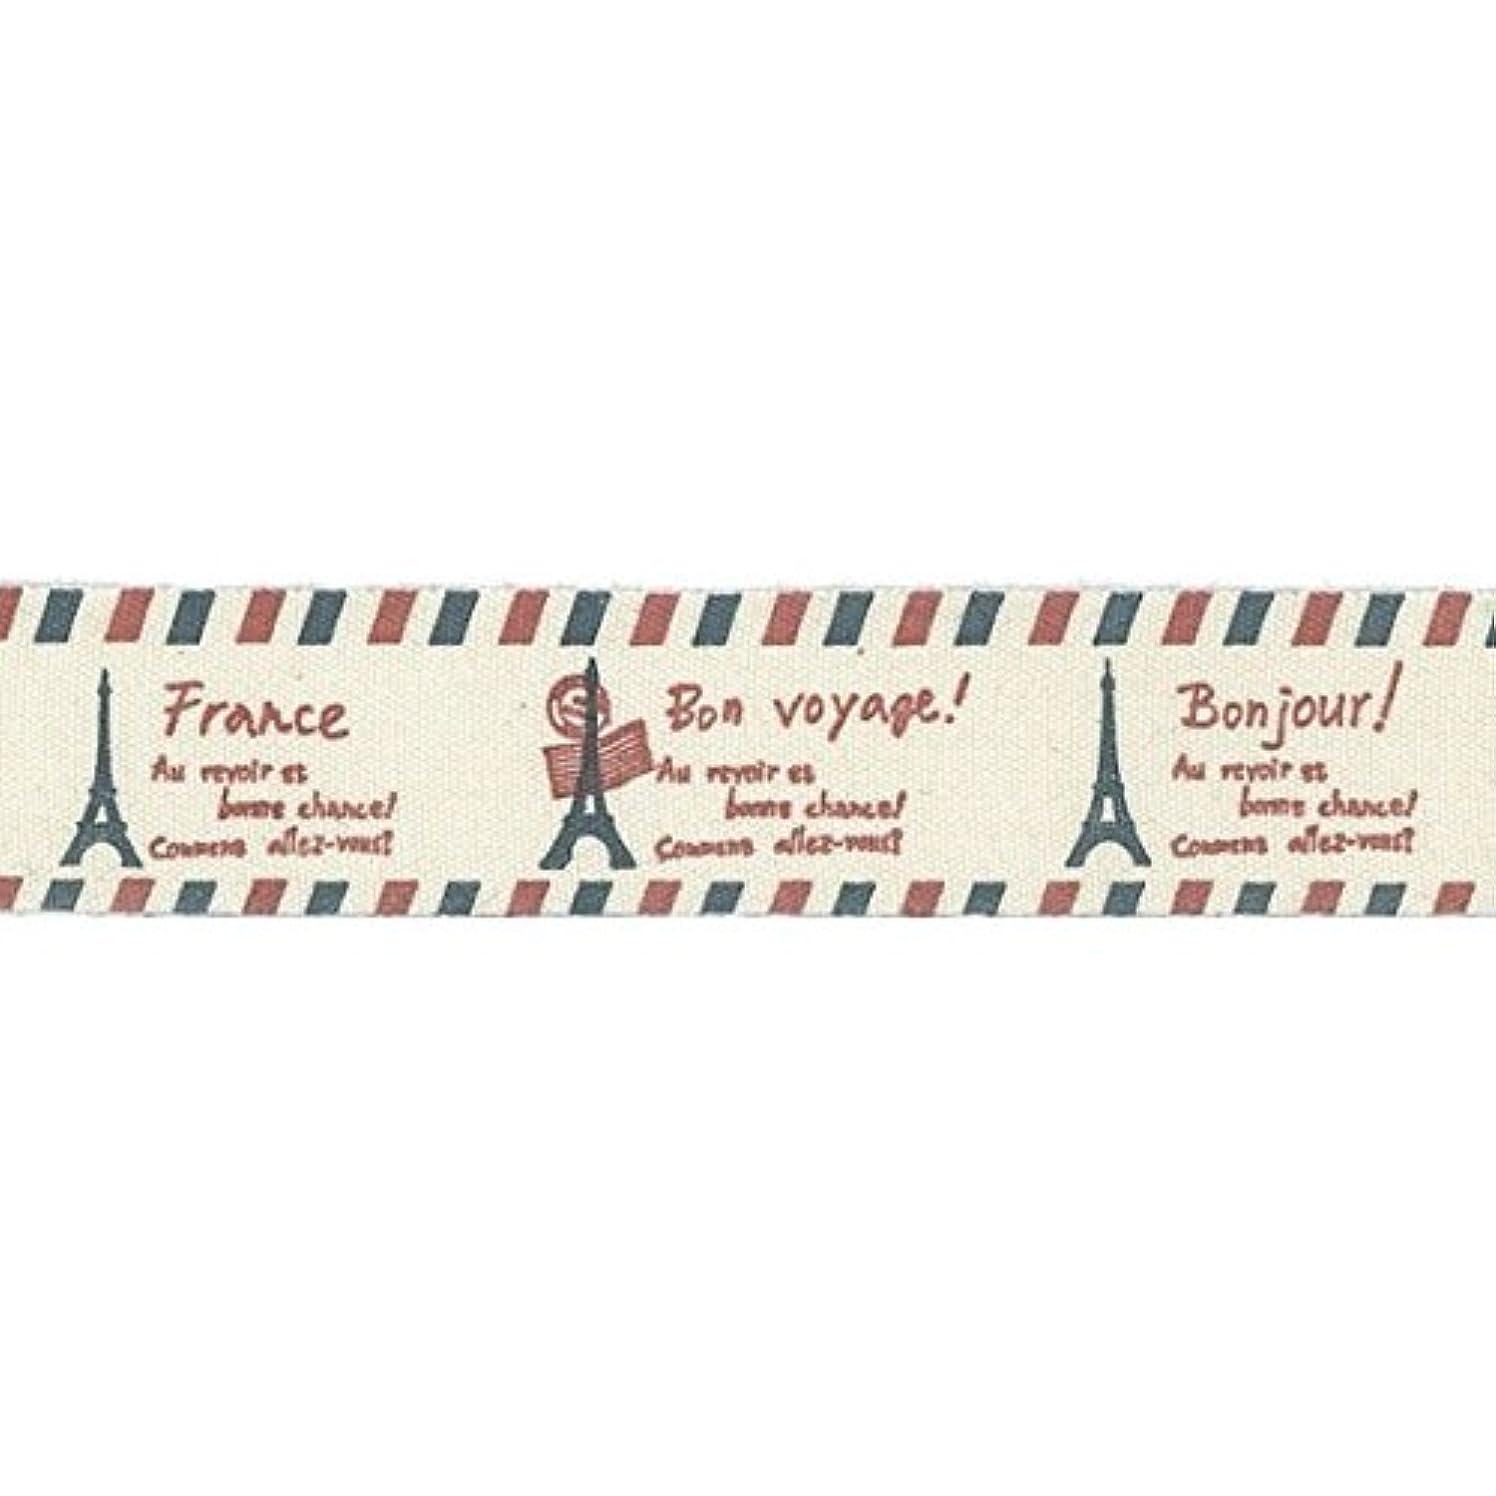 Vaessen Creative Printed Ribbon, Fabric, Multicolored, One Size